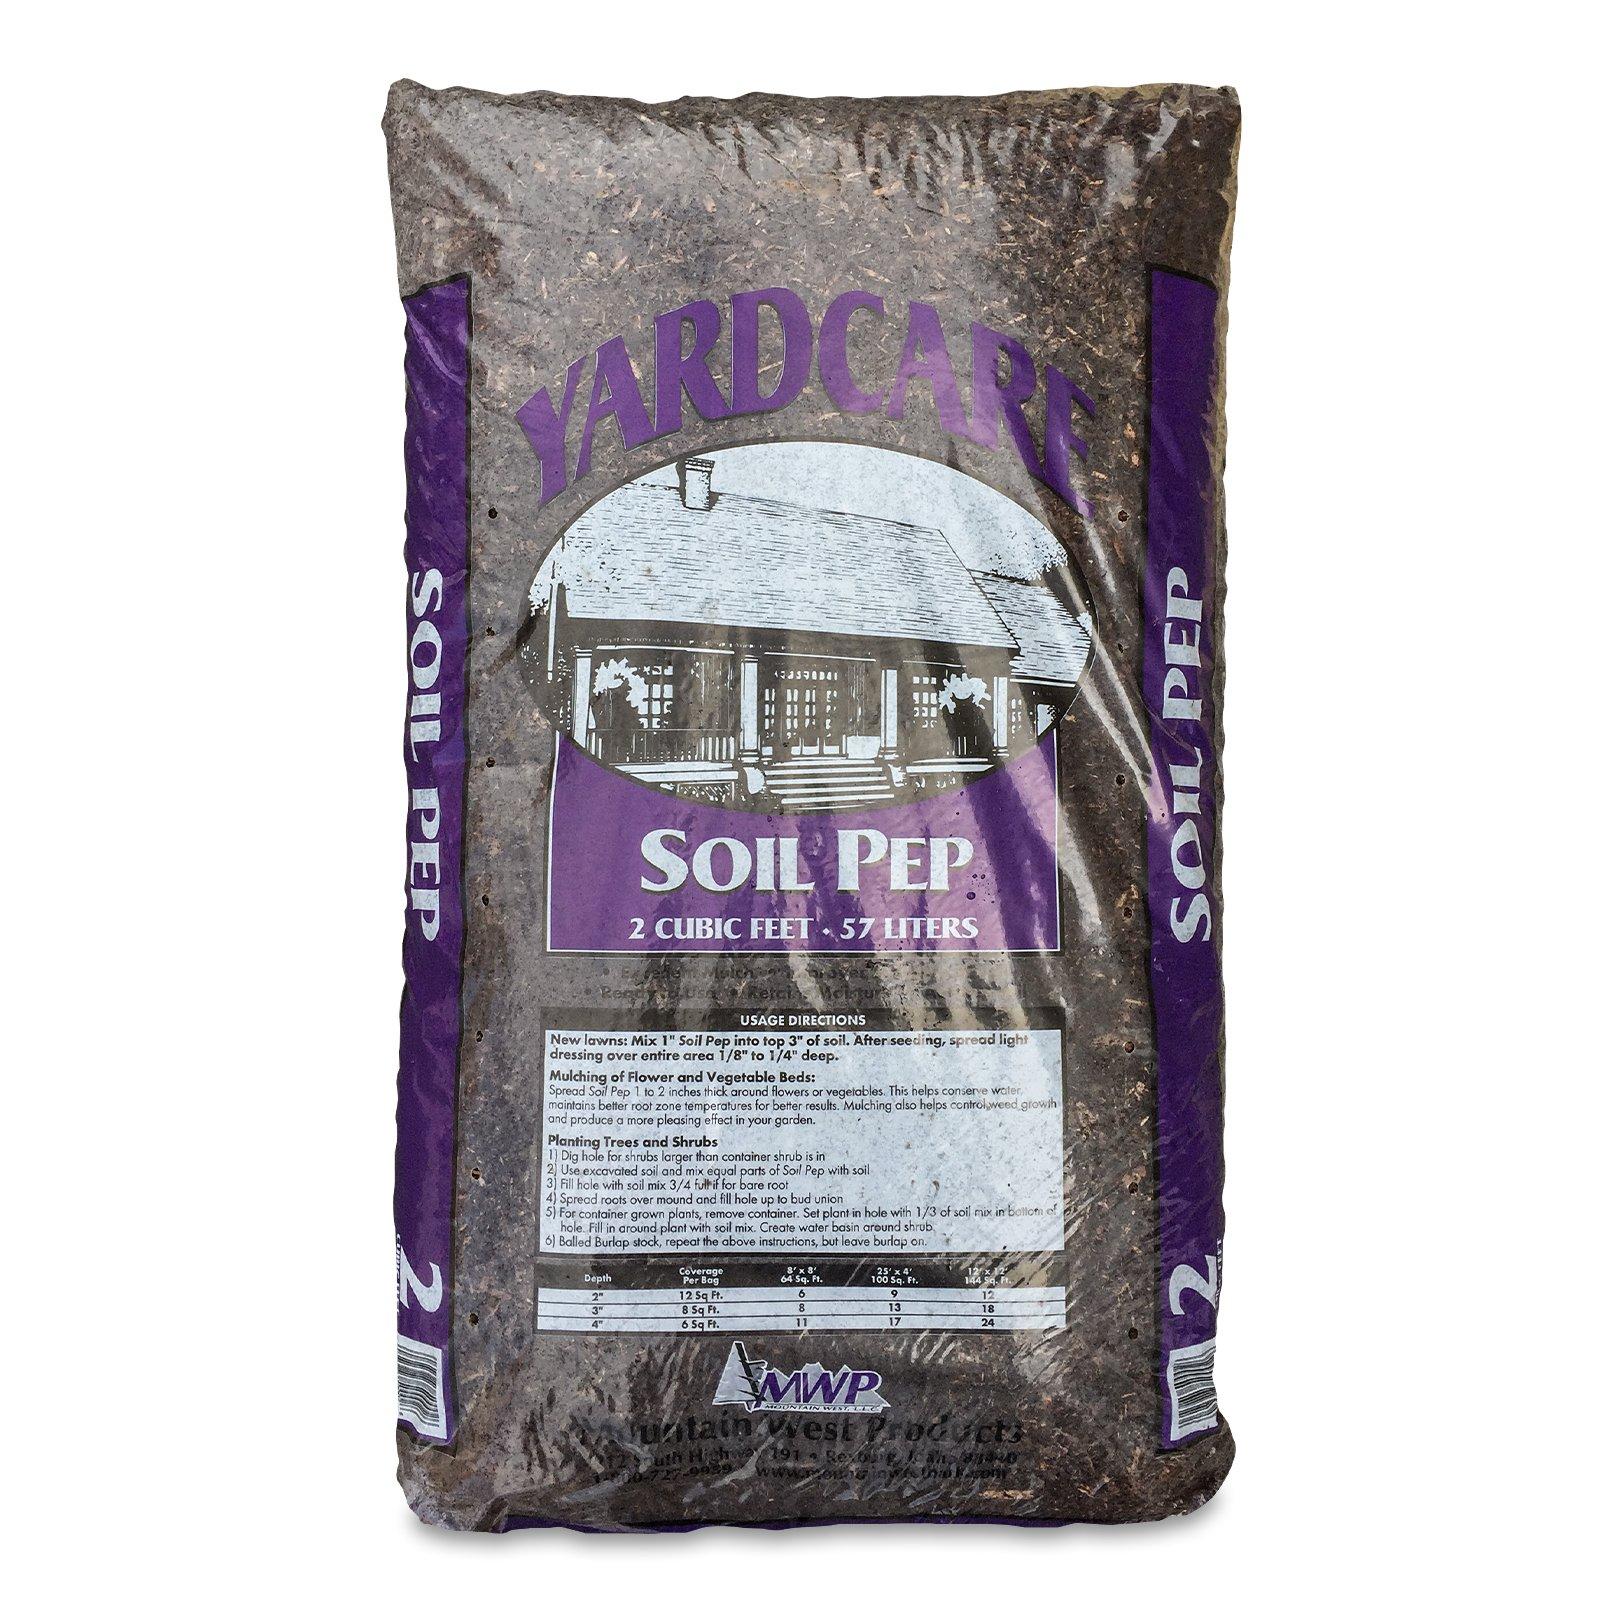 Mountain West Bark Soil Pep Mulch